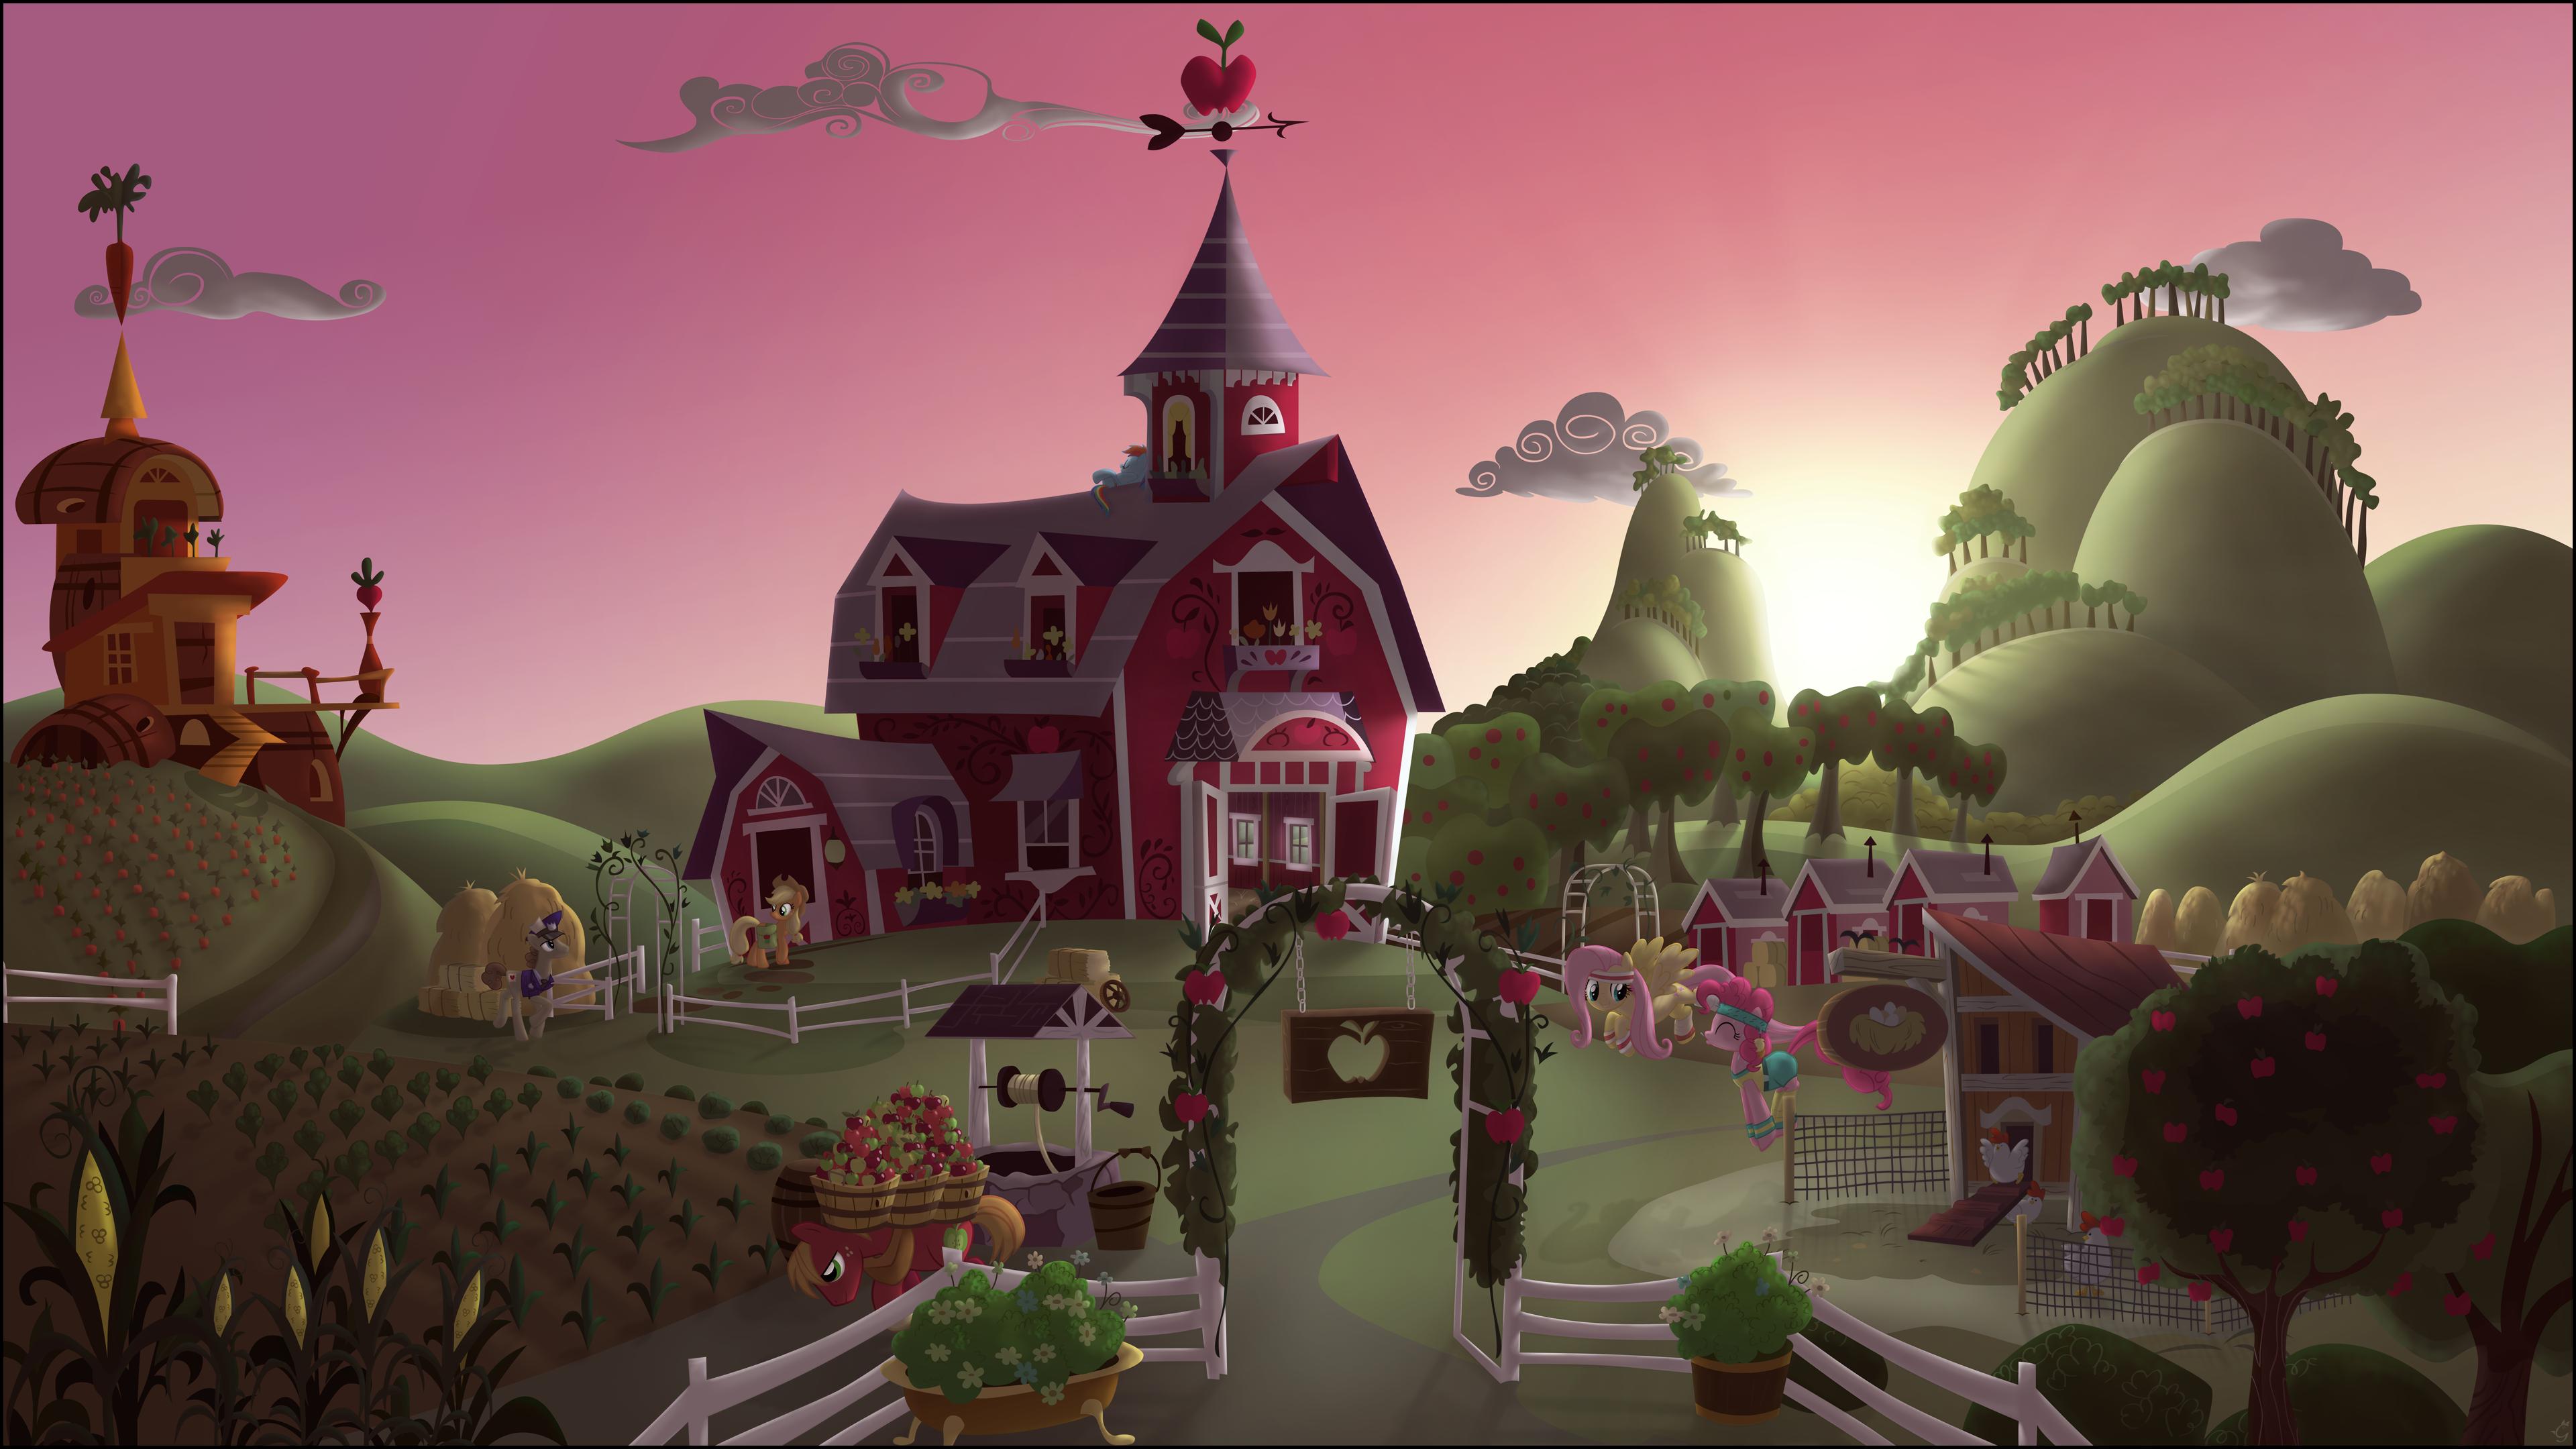 sunrise_at_the_apple_farm_by_stinkehund-d56g24x.png (3840×2160)